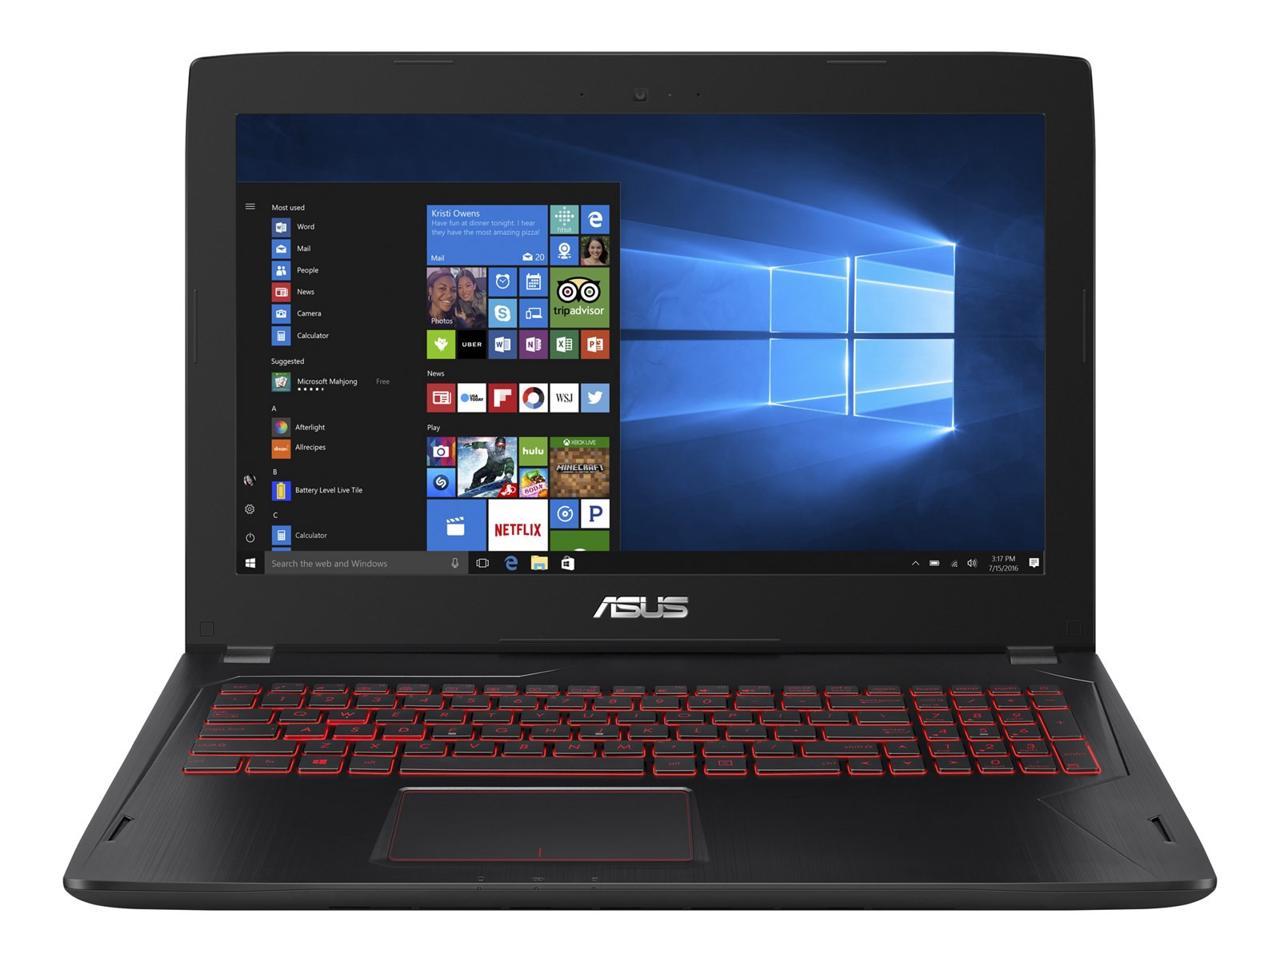 $970 - ASUS FX502VM-AS73 Gaming Laptop, i7 7700HQ, 16 GB DDR4, 1 TB HDD ,128 GB SSD, GTX 1060 $969.99